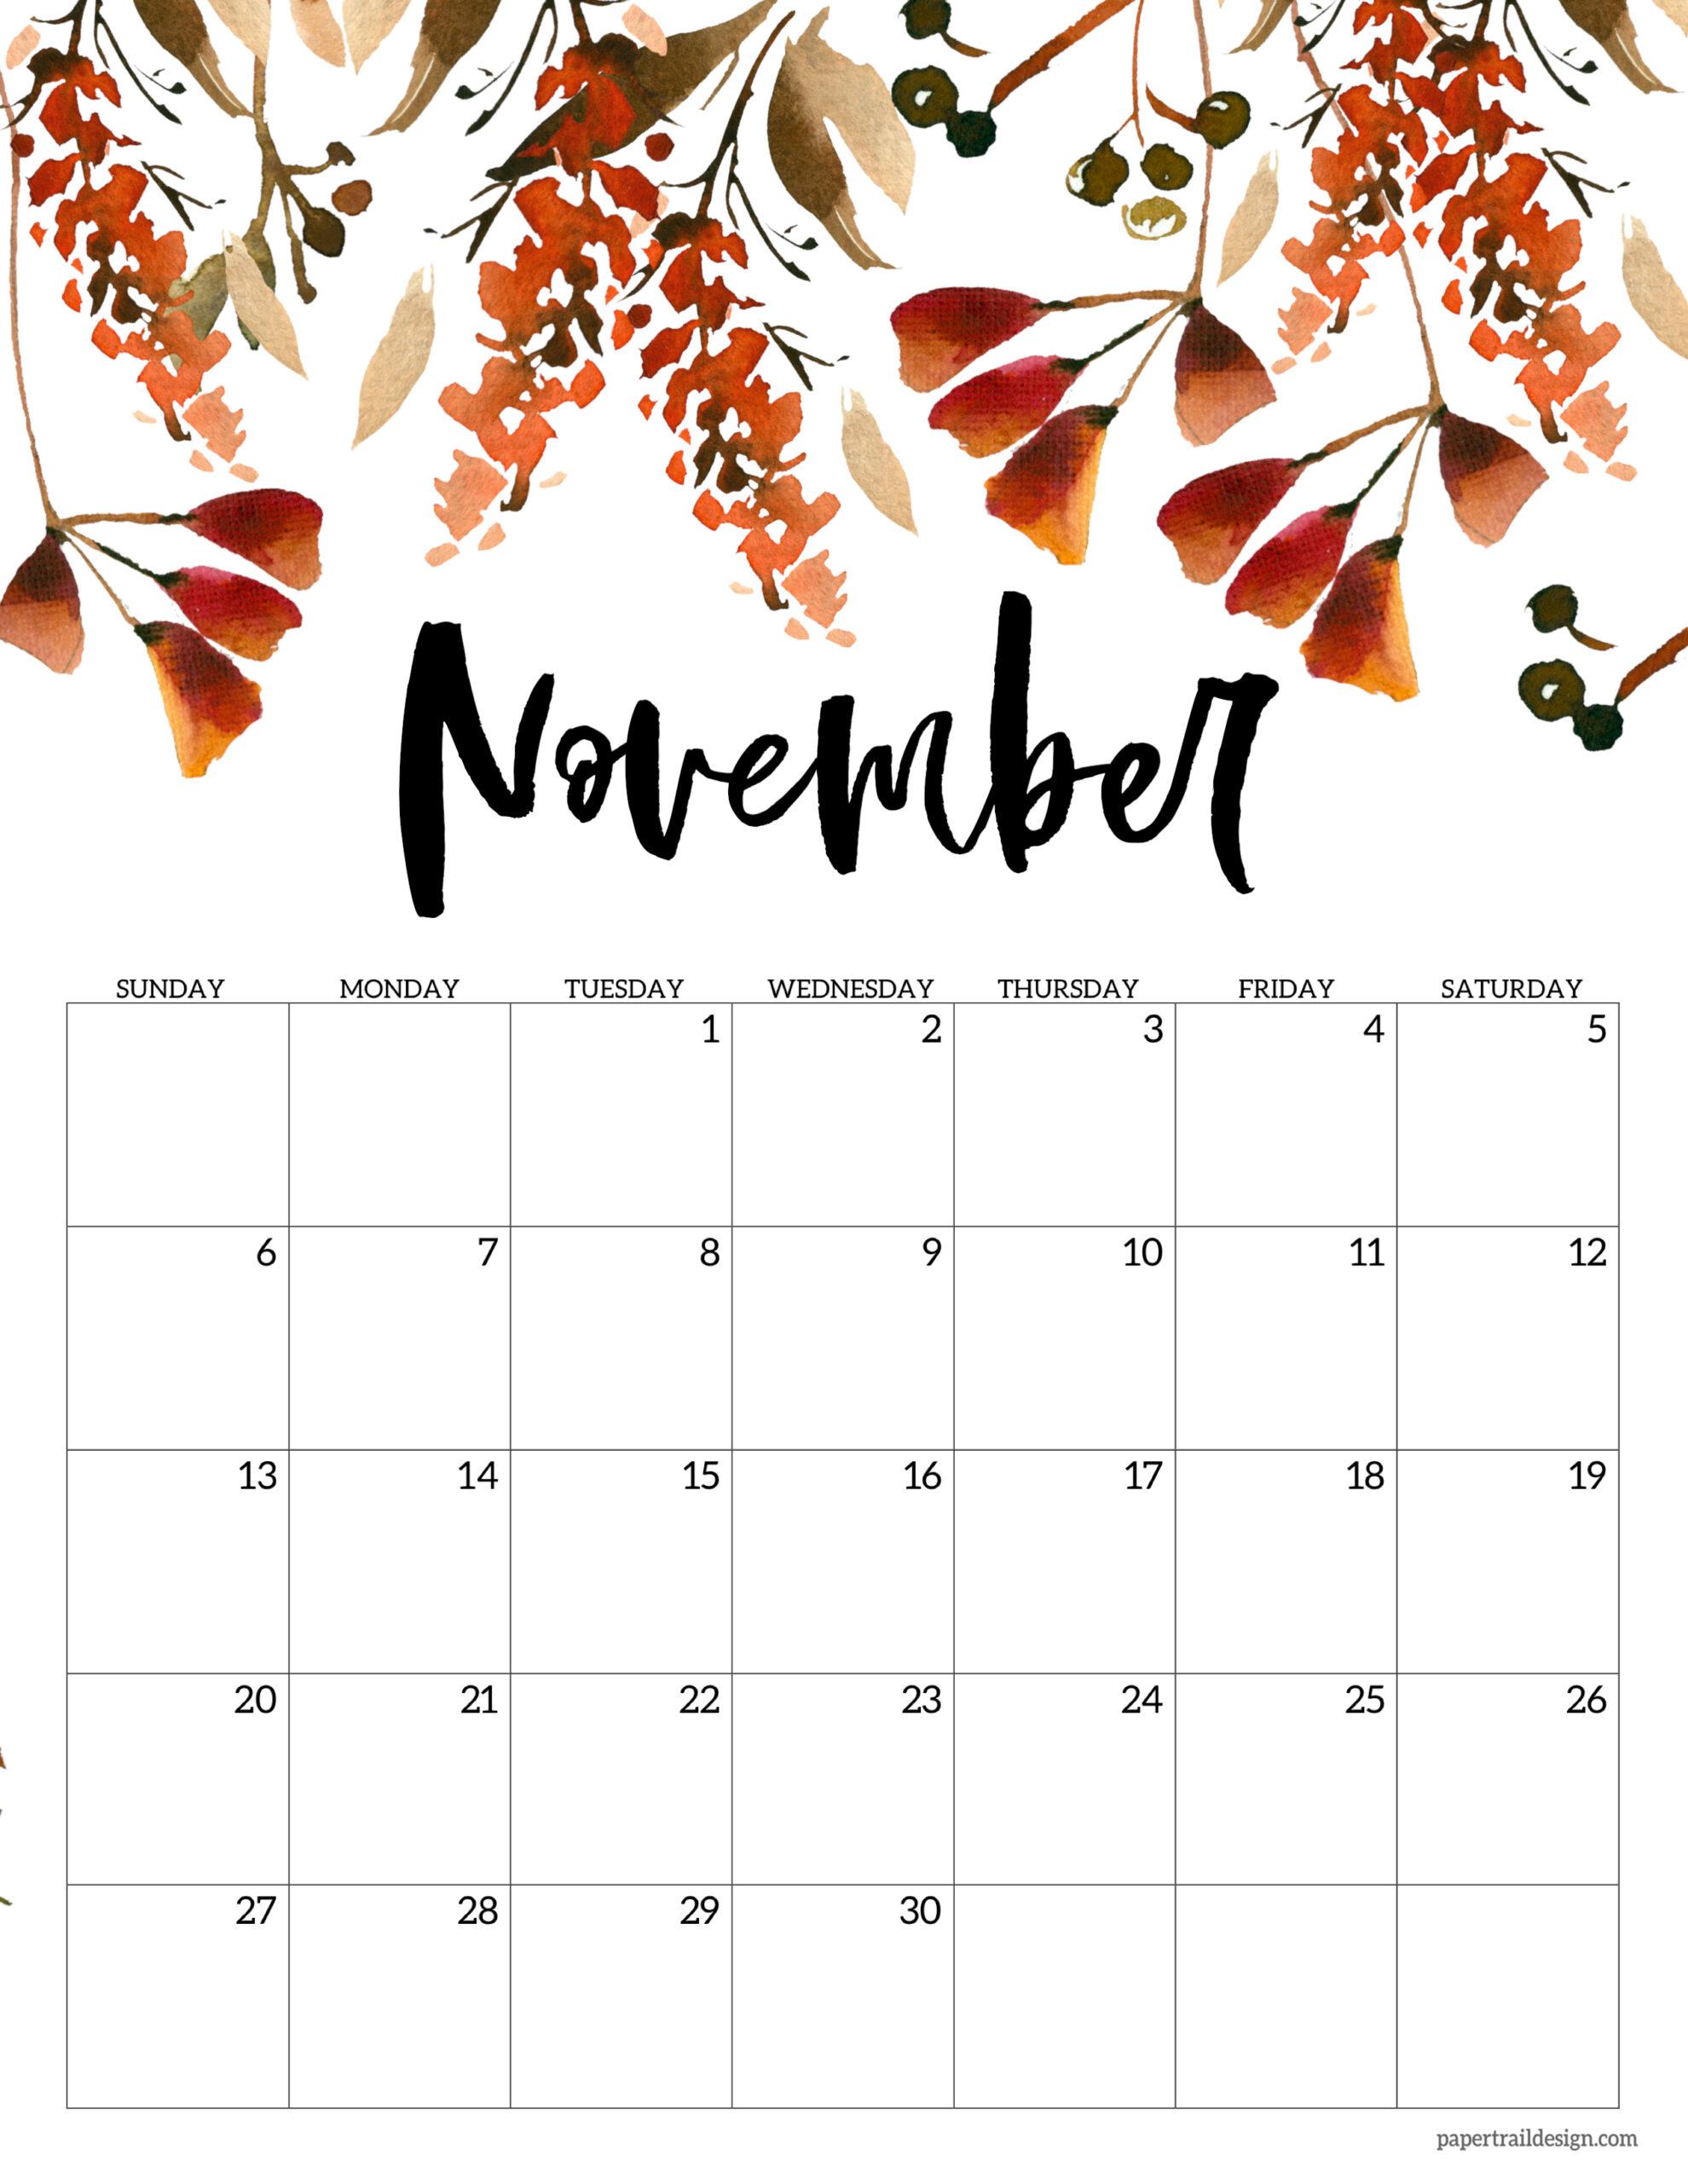 Printable November 2022 Calendar.Free 2022 Calendar Printable Floral Paper Trail Design